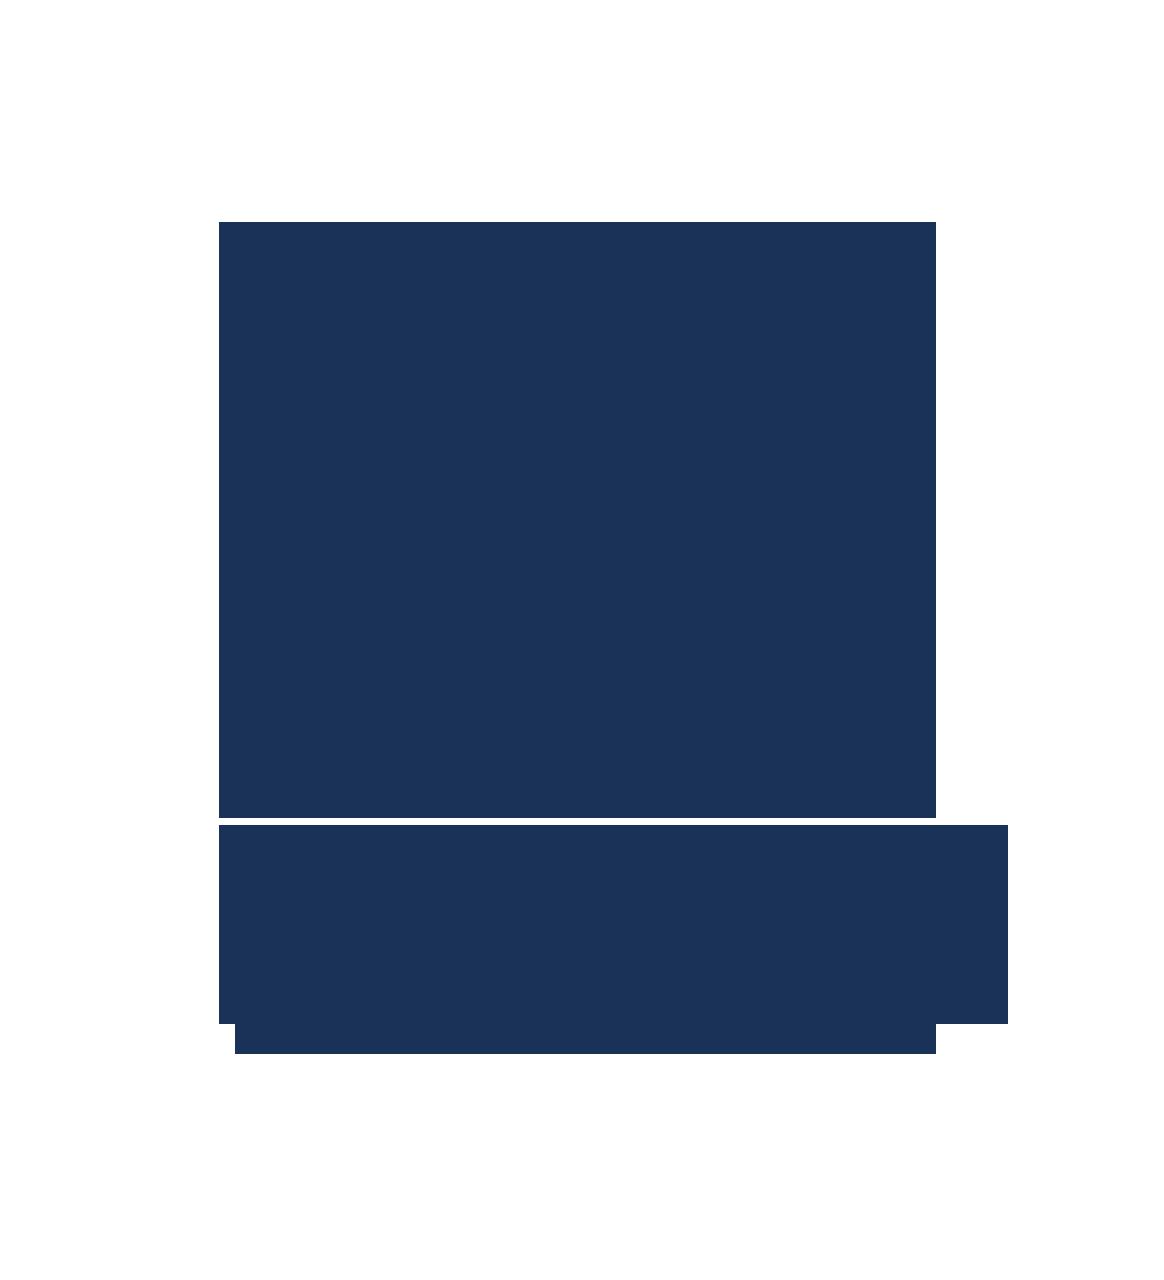 USAA <br> Day 1 Award Dinner Sponsor <br>Volunteer Training Sponsor